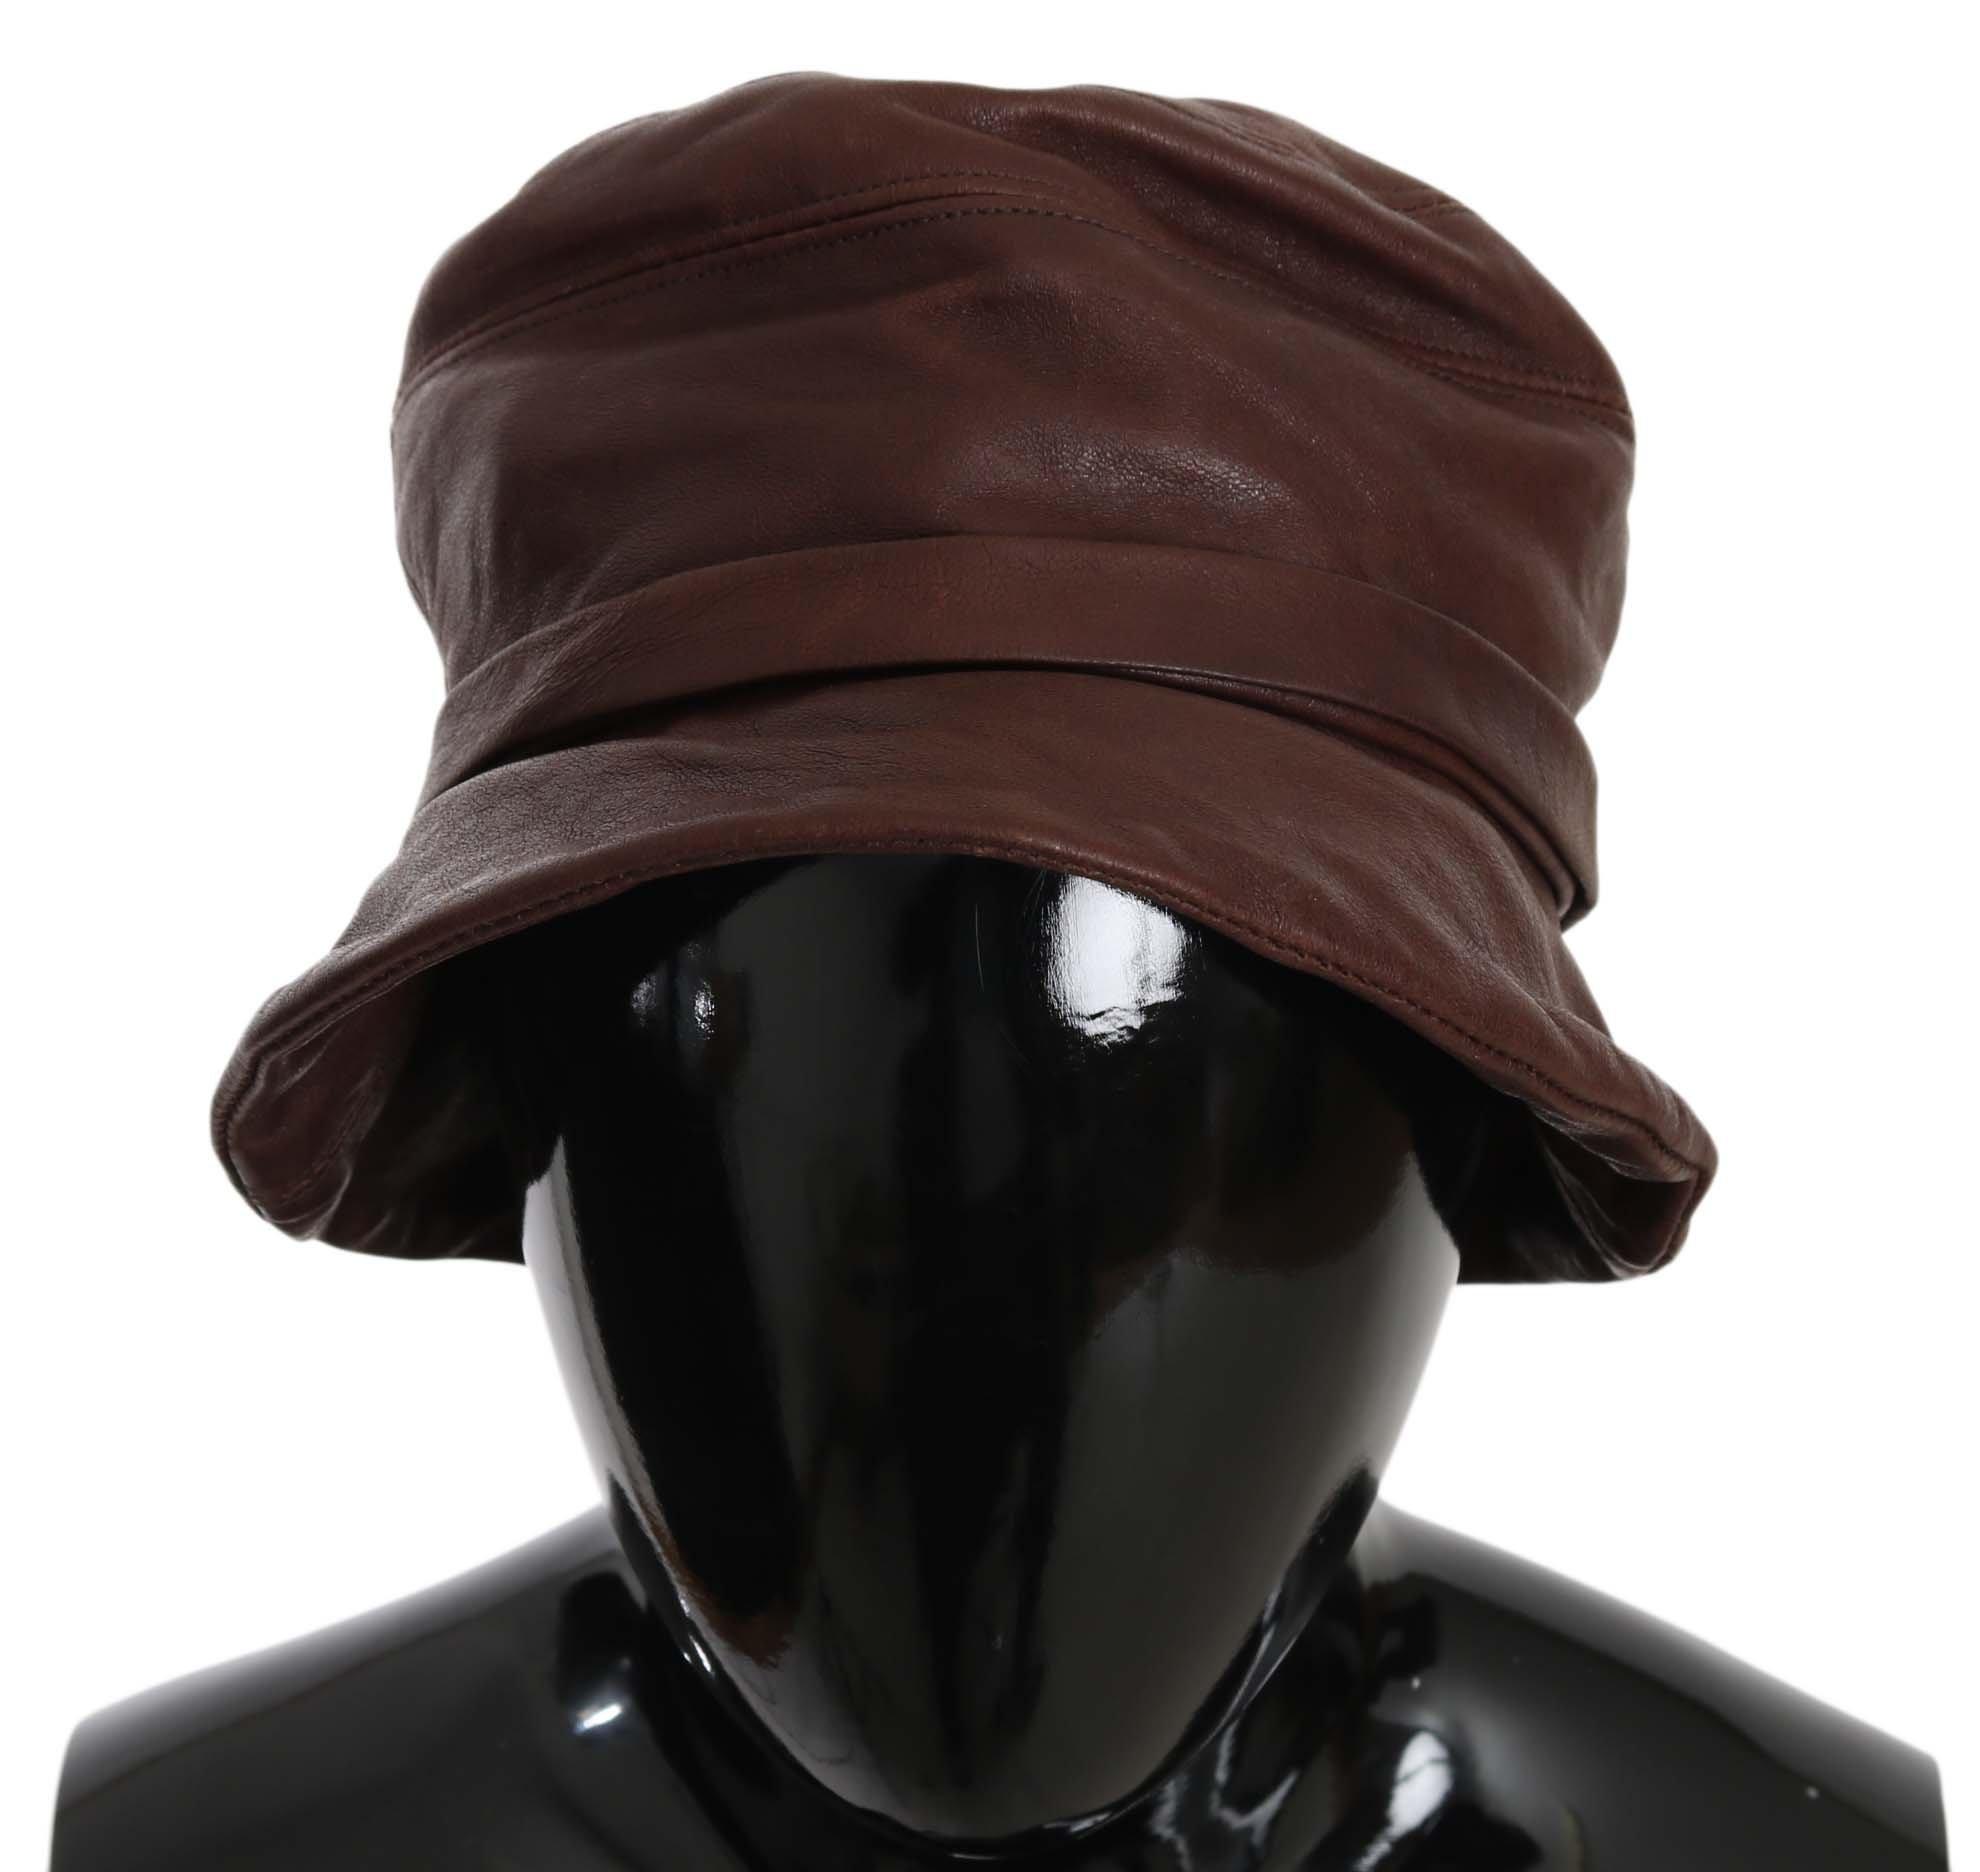 Dolce & Gabbana Women's Hat Brown HAT70215 - 56 cm XS